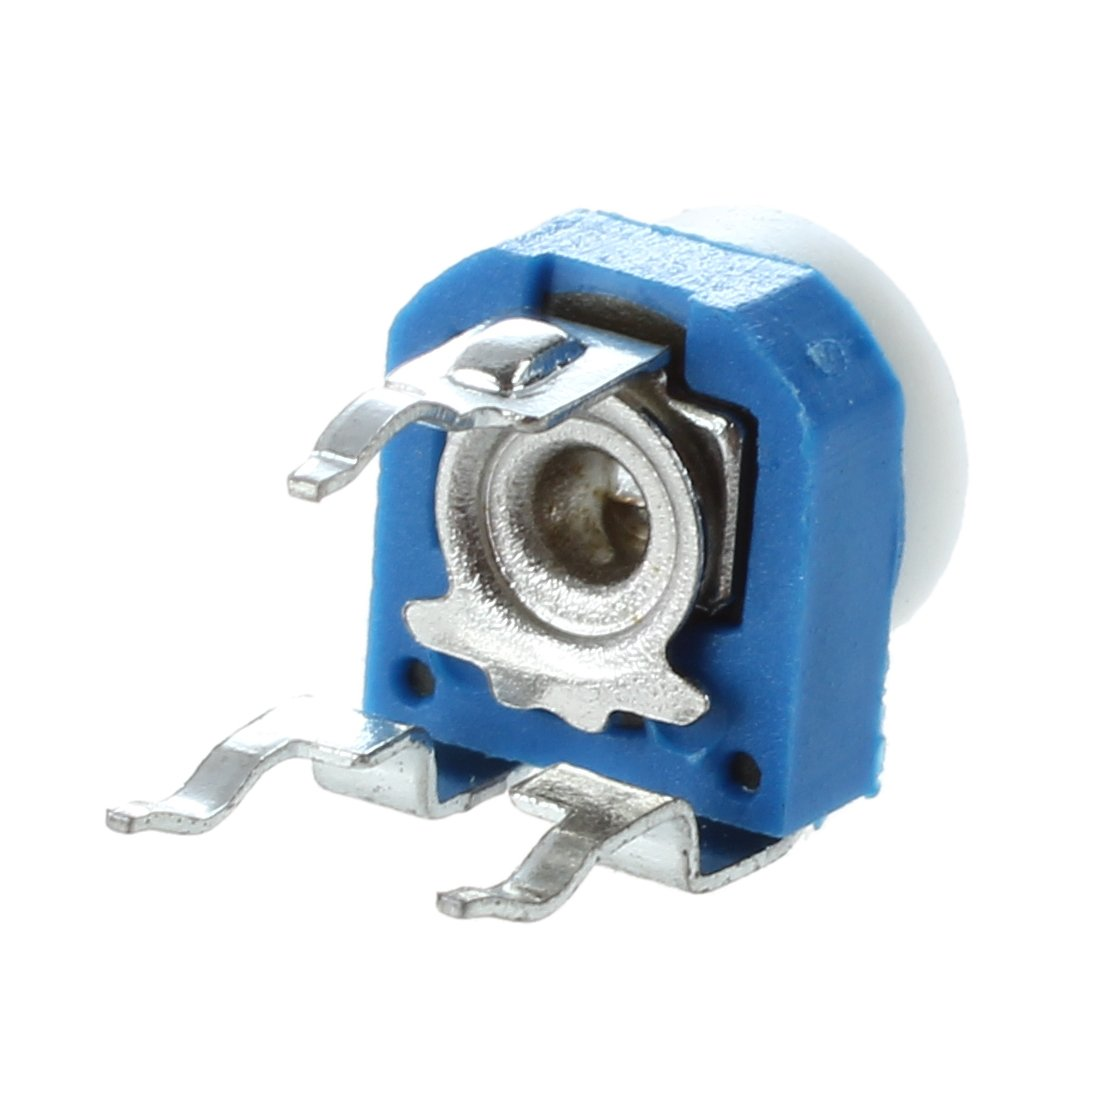 2x trimmer cermet 100 kohm 10mm verticale monogiro 1 giro single turn